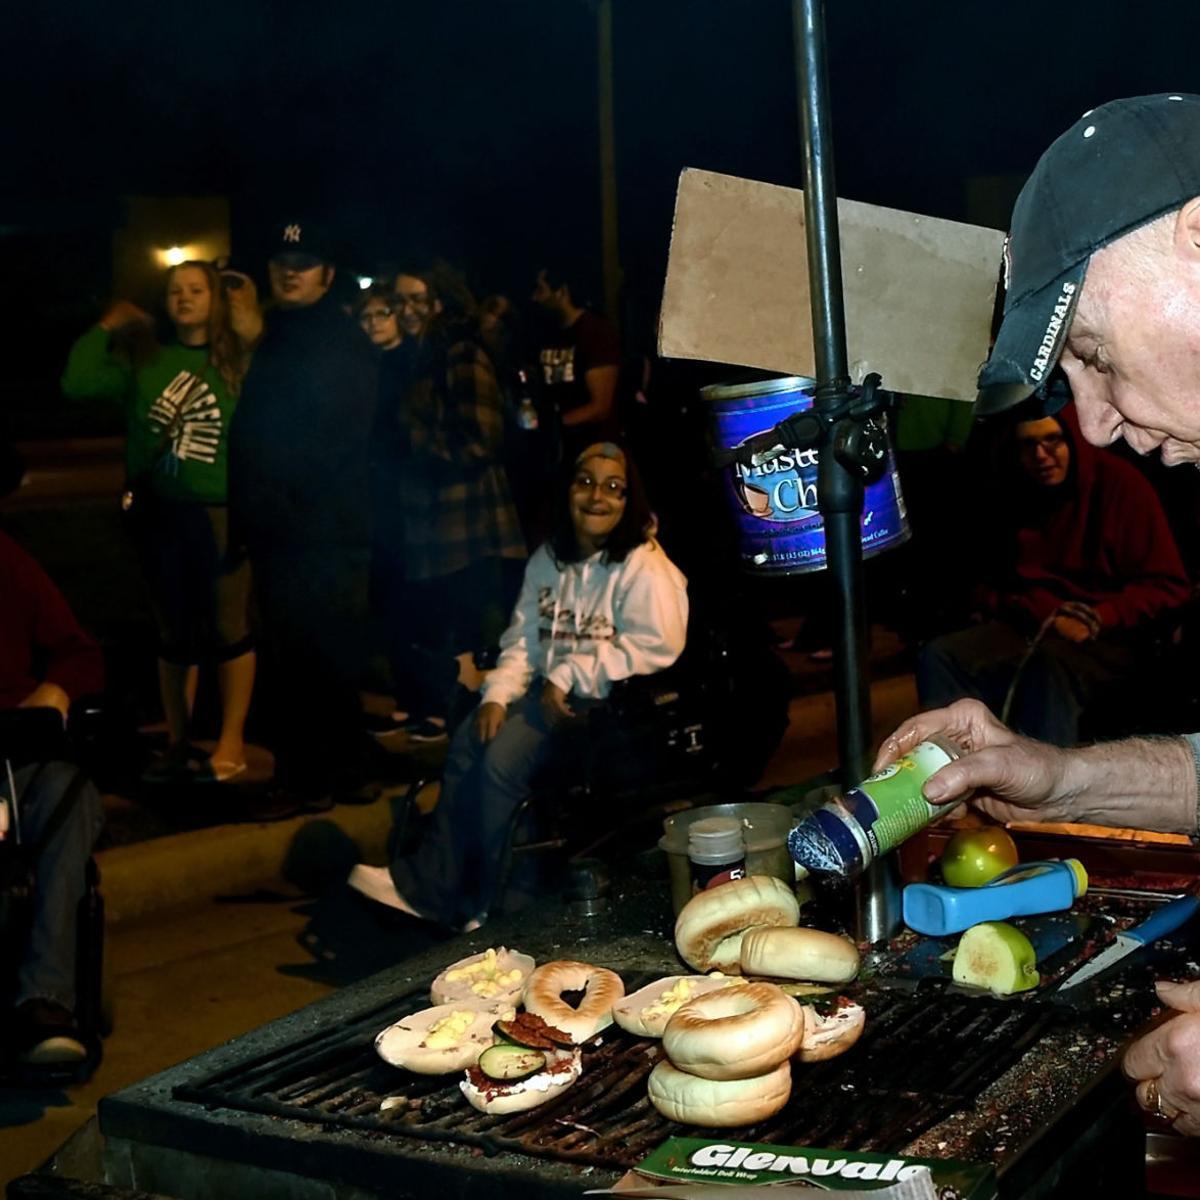 Craigslist Mt Vernon Il >> Legendary Carbondale Bagel Business For Sale For 3 500 On